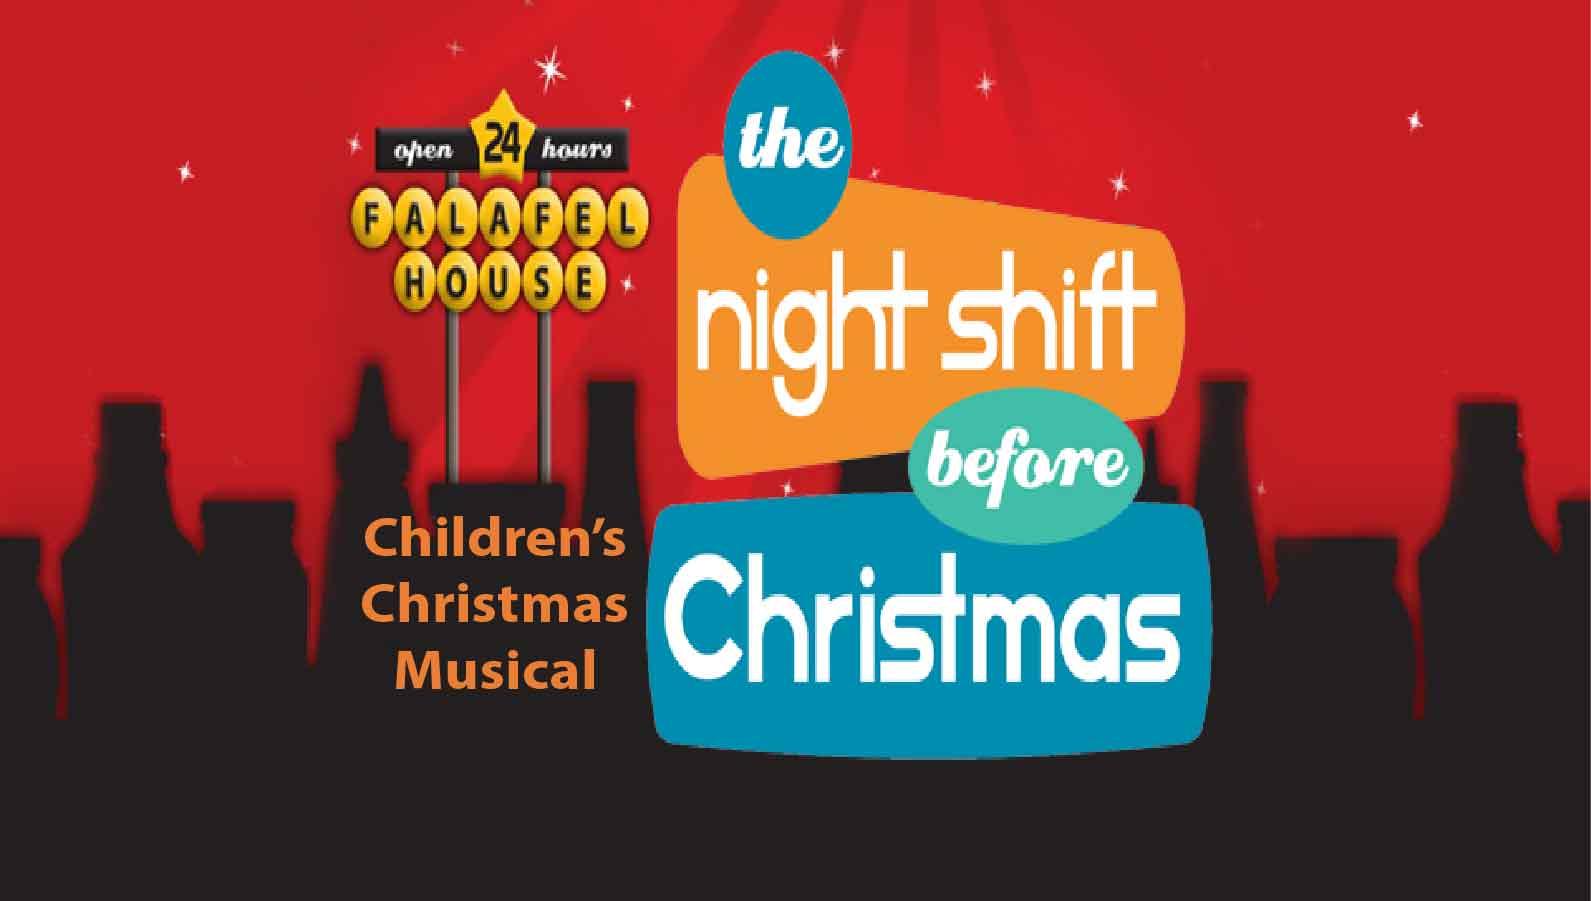 Night-Shift-Before-Christmas.jpg